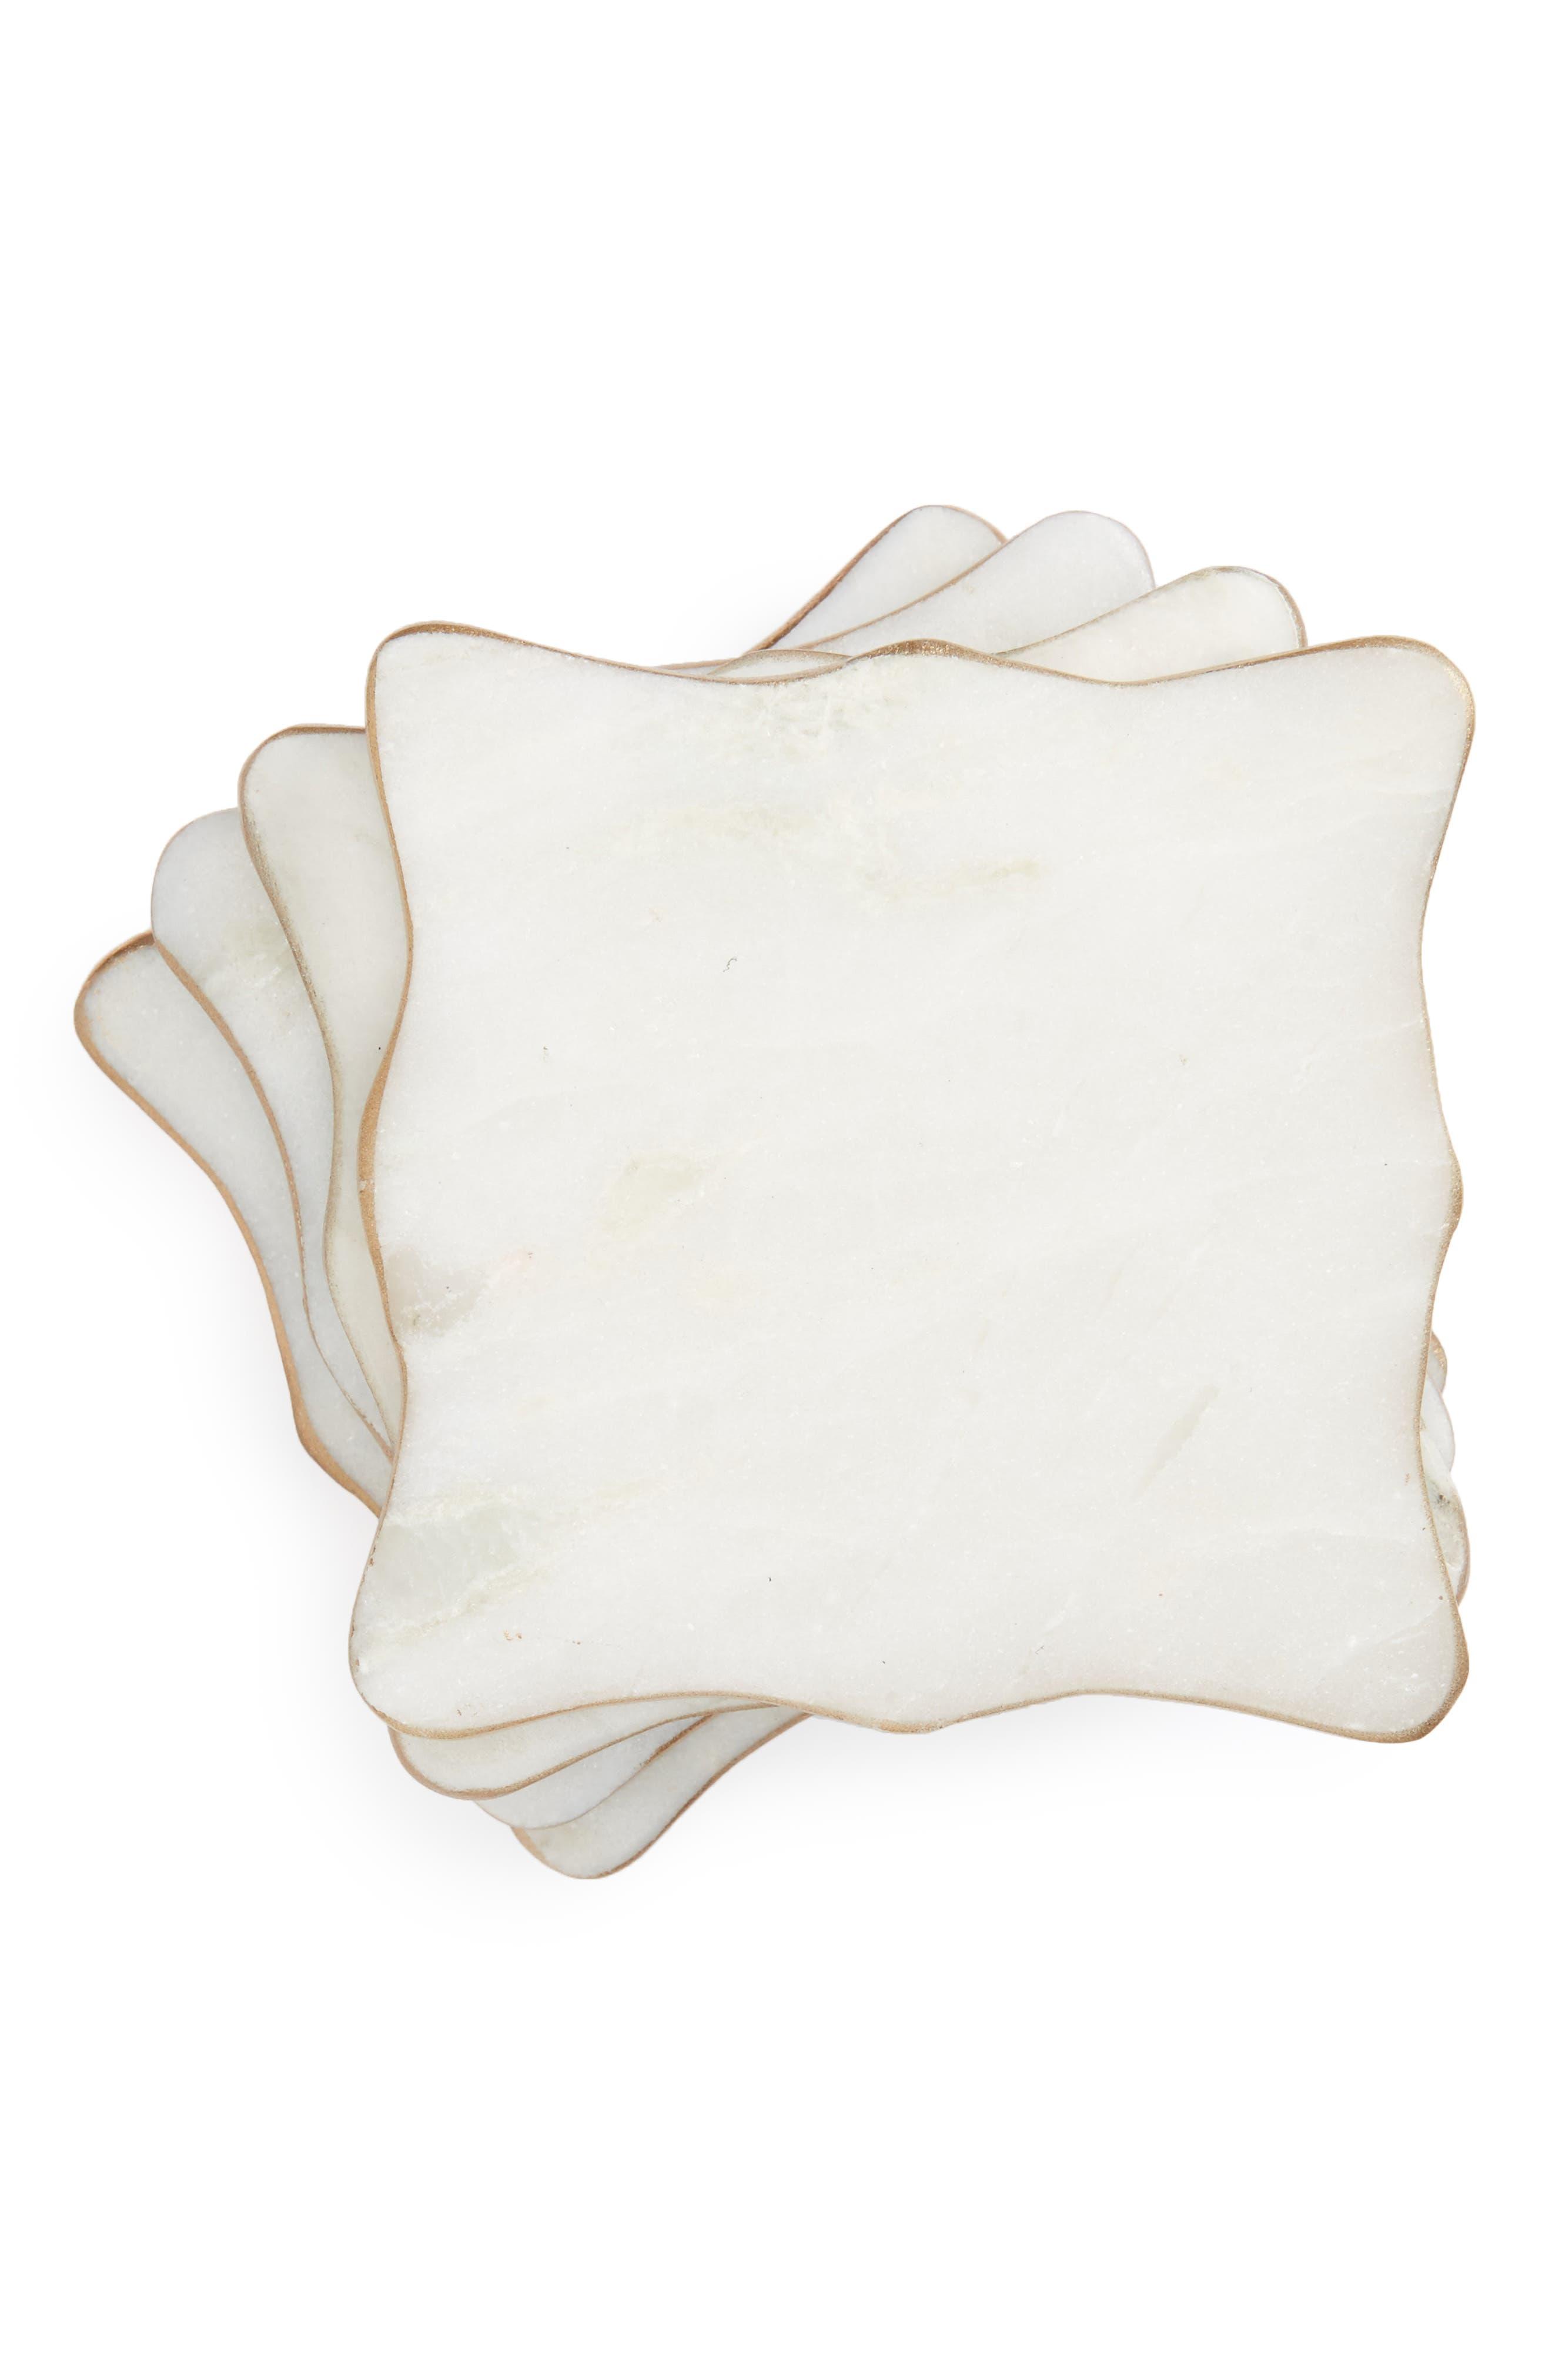 Set of 4 Marble Coasters,                             Main thumbnail 1, color,                             White Multi